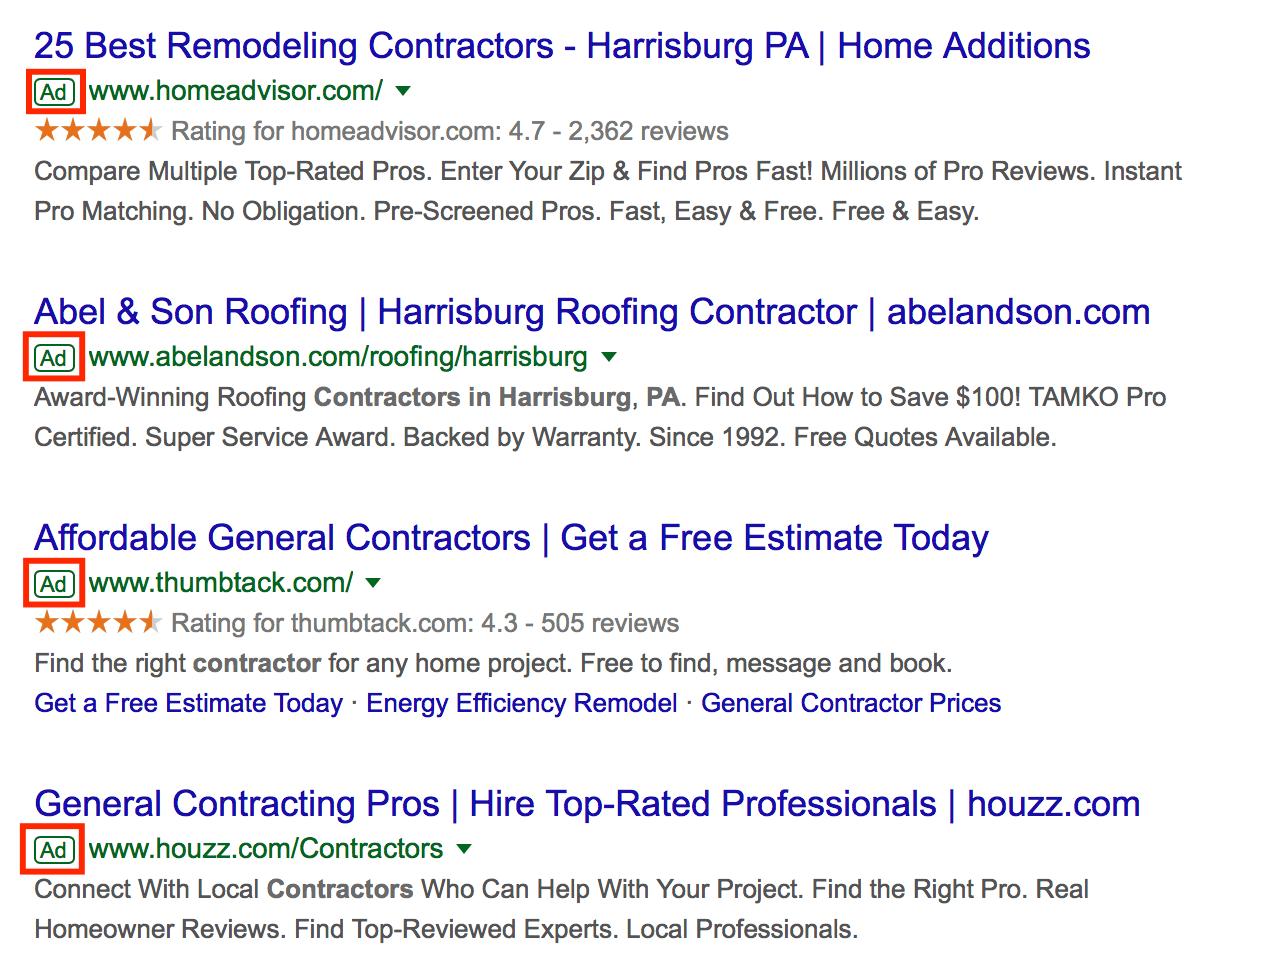 16 Kick-Butt Marketing Ideas for Contractors - Contractor Marketing